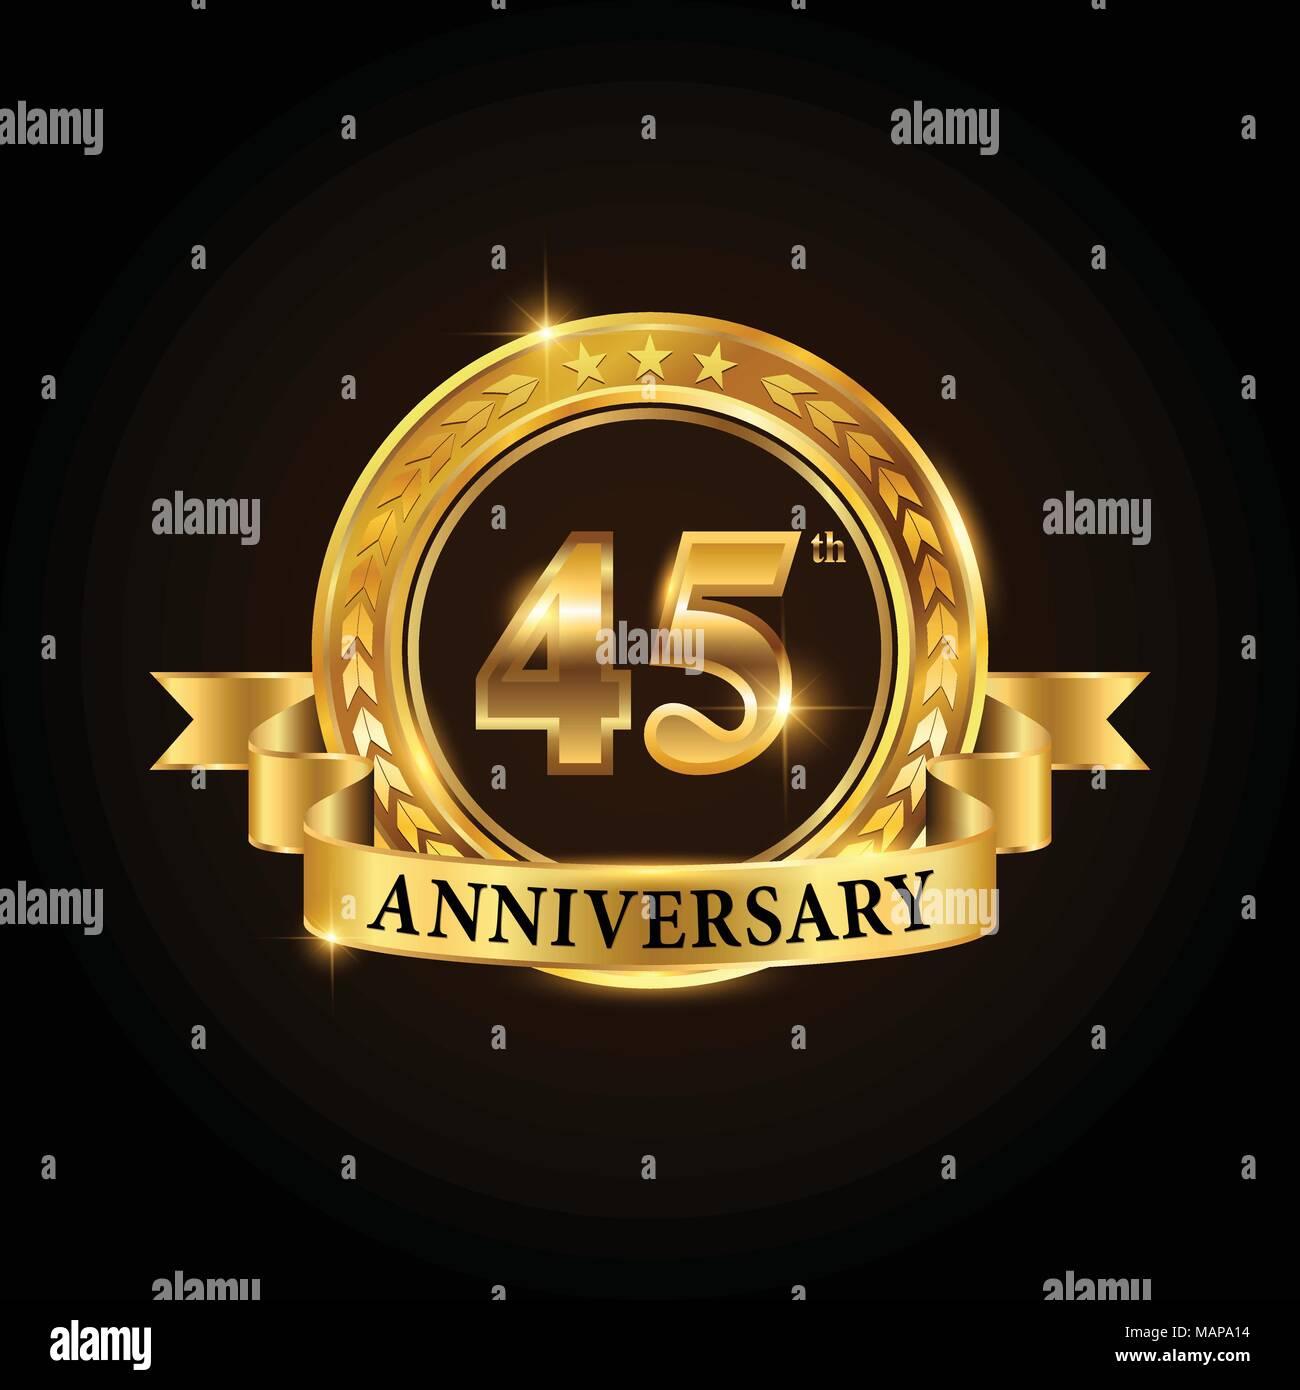 45 Years Anniversary Celebration Logotype Golden Anniversary Emblem